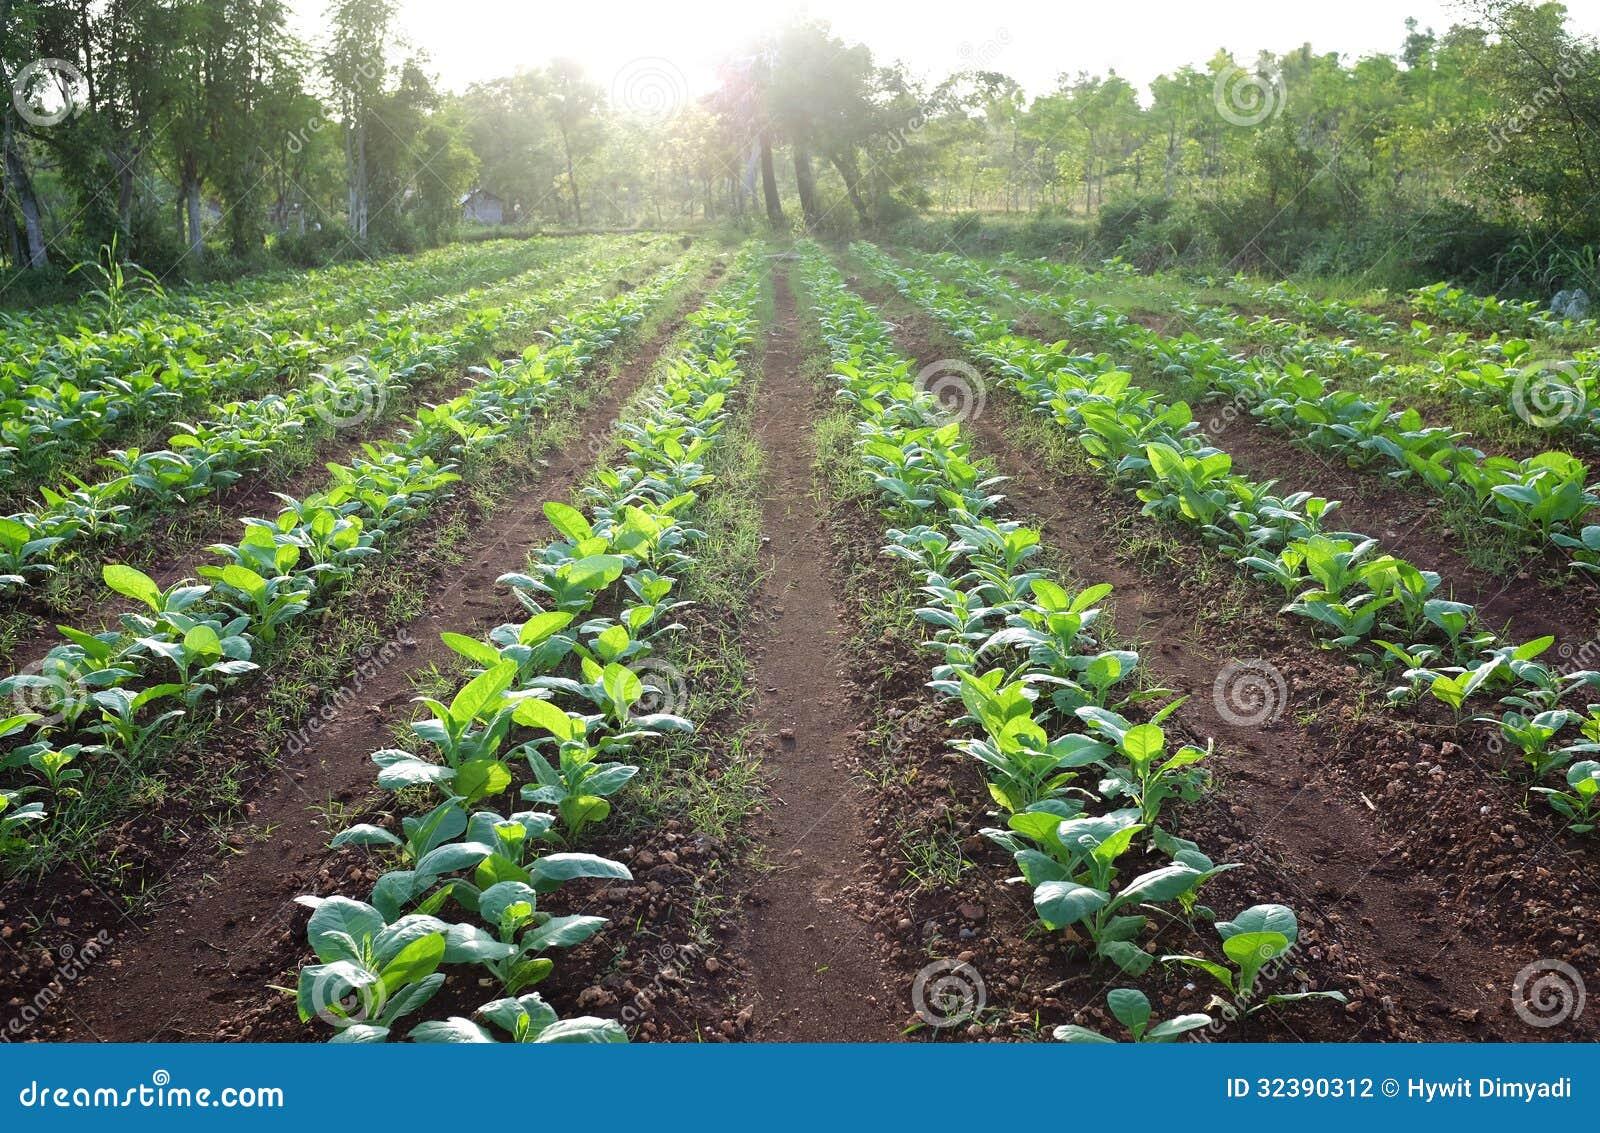 Tobacco Farm Field Stock Photography - Image: 32390312